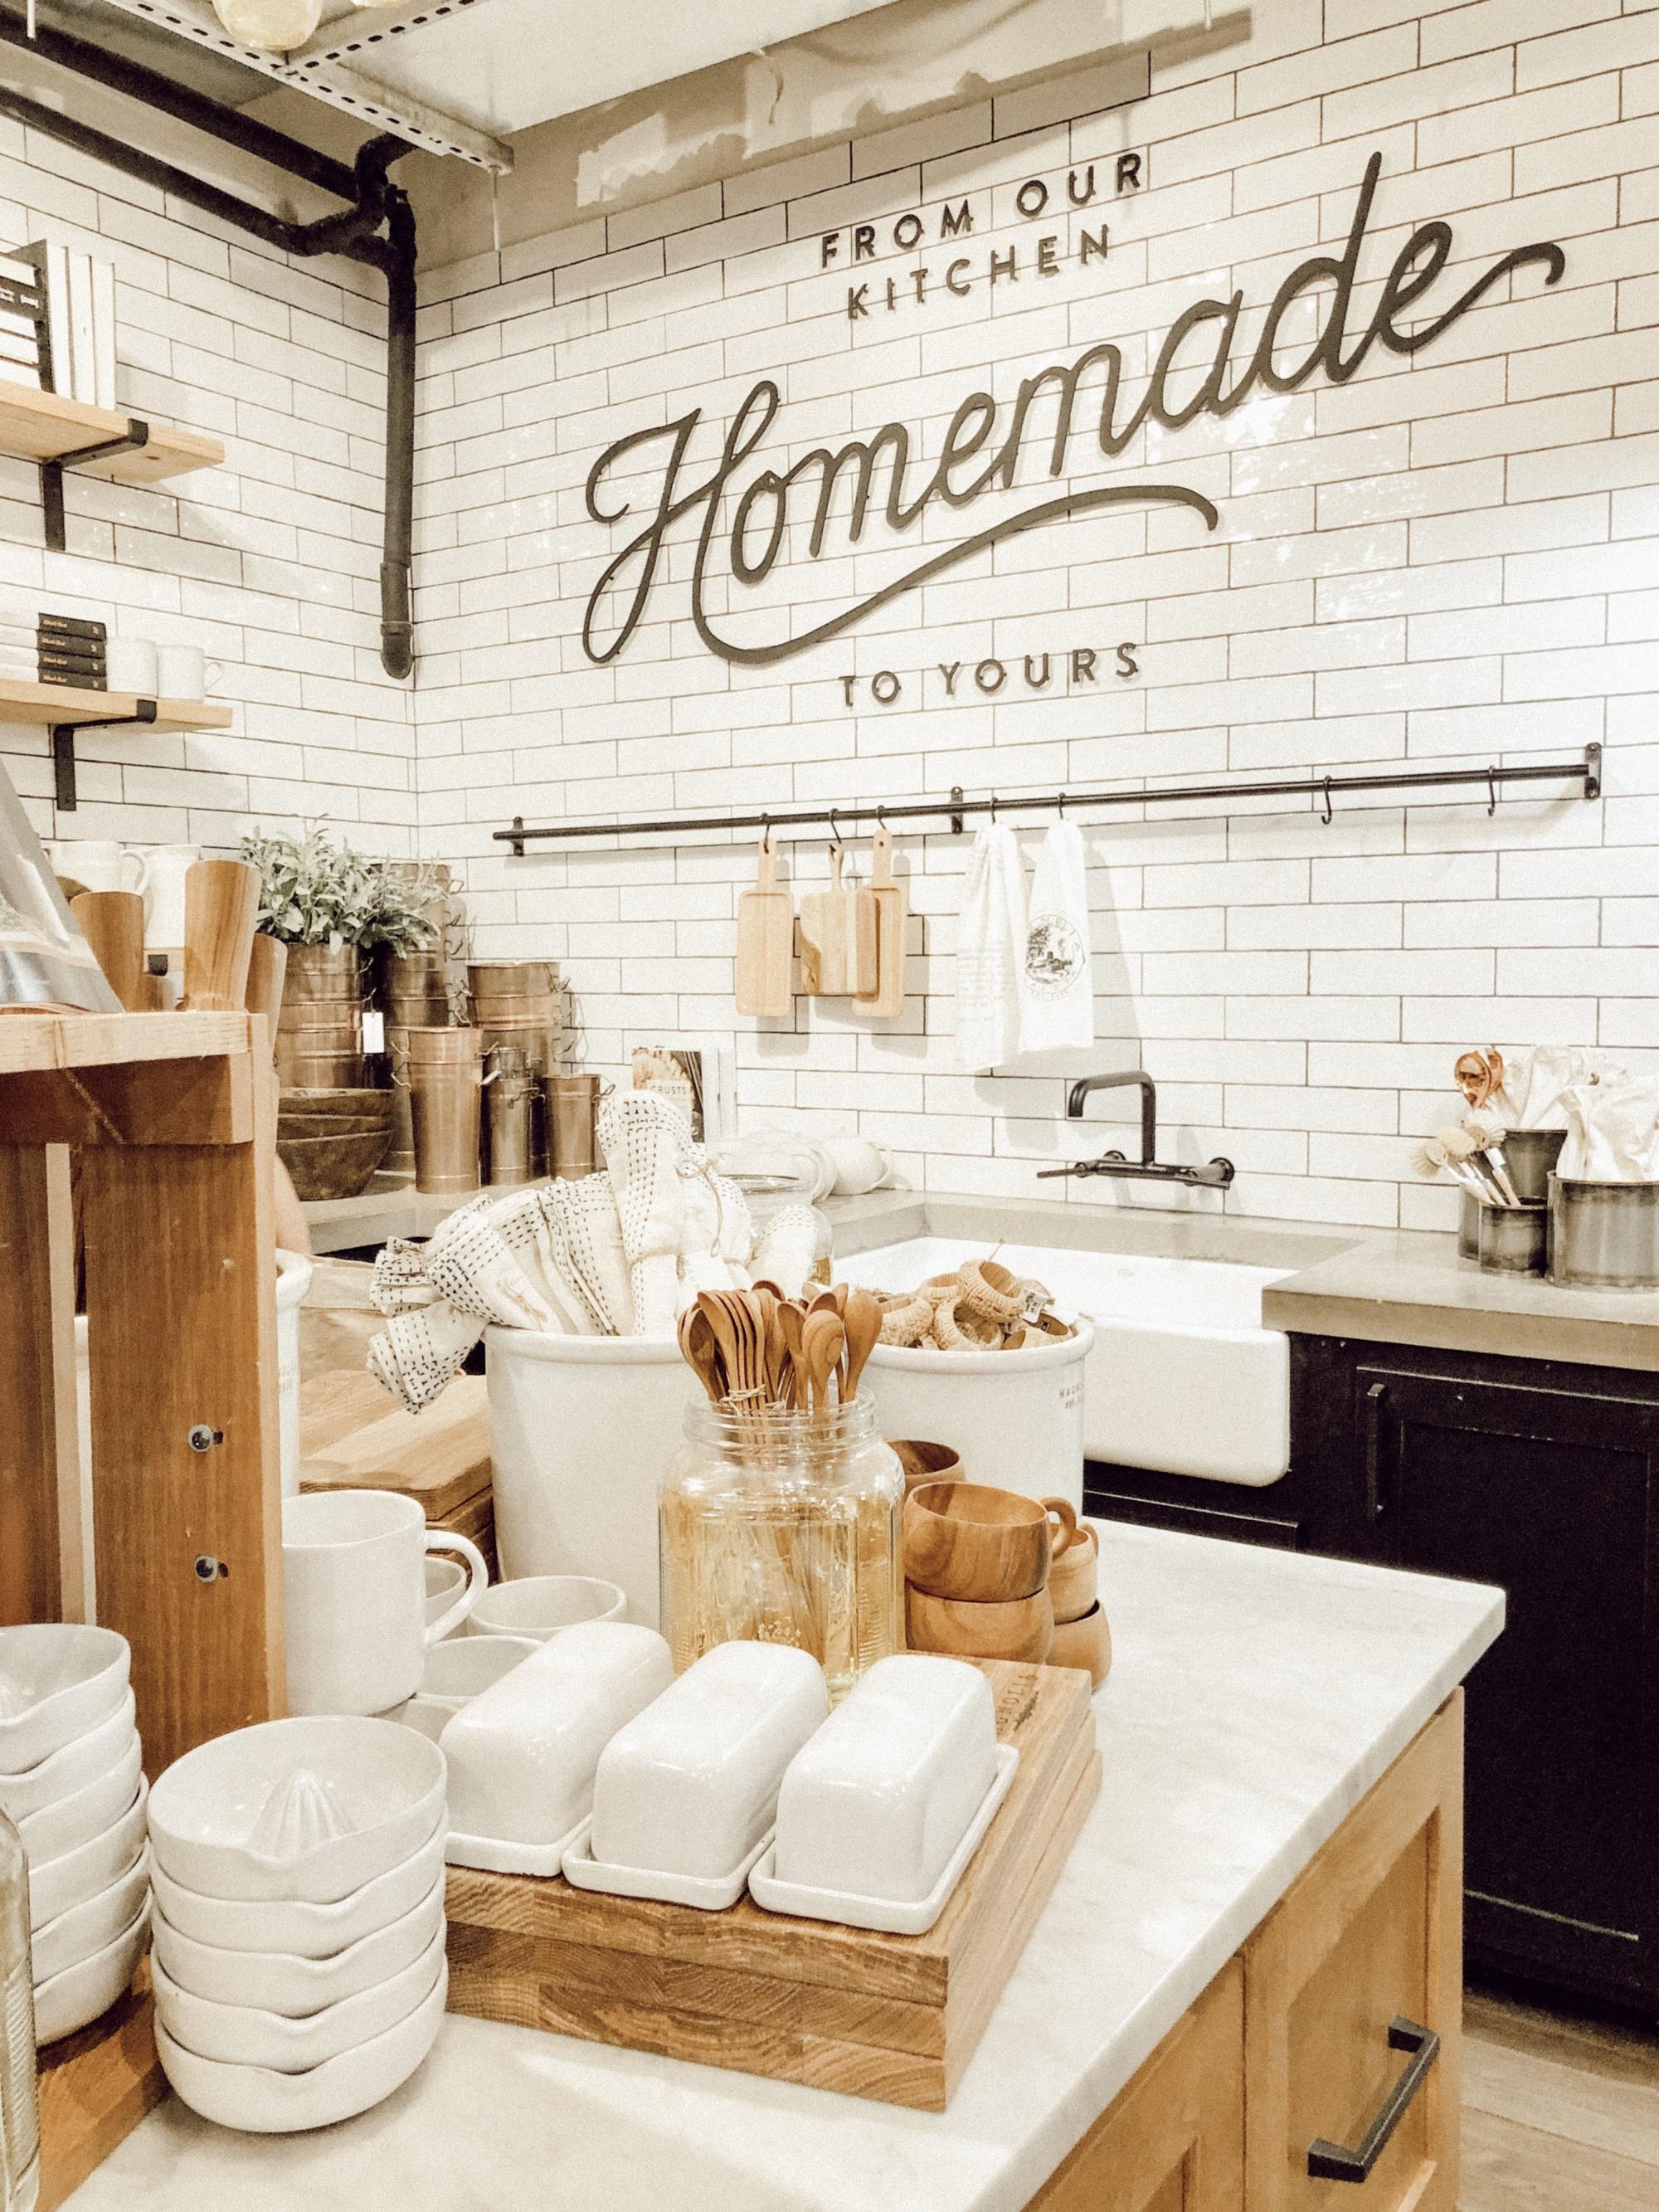 The Magnolia kitchen is a farmhouse style dream!